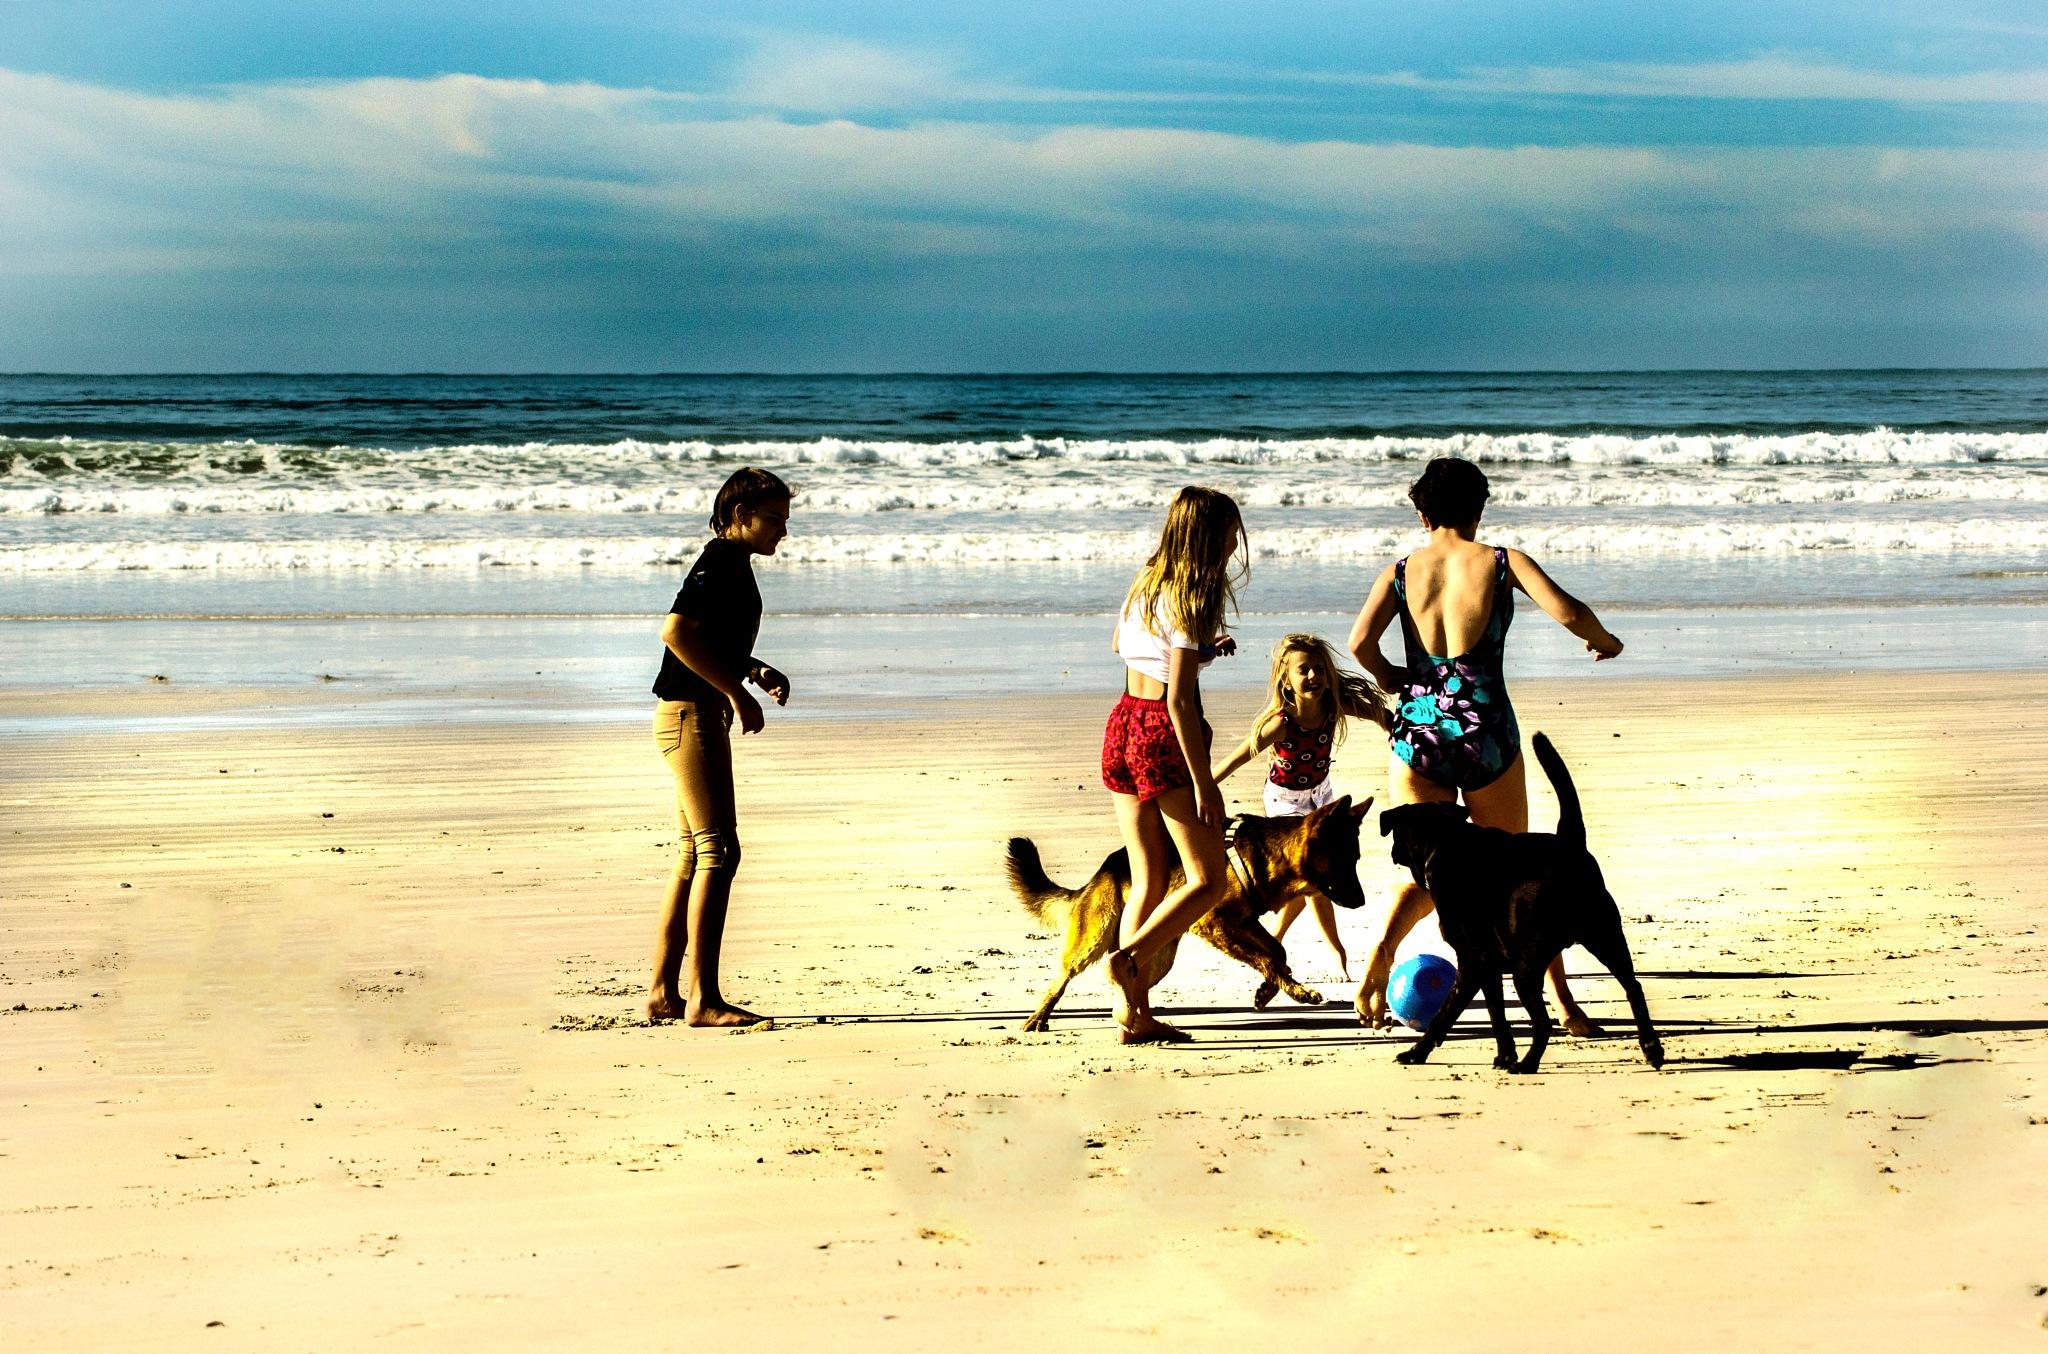 Beach soccer by Nauta Piscatorque